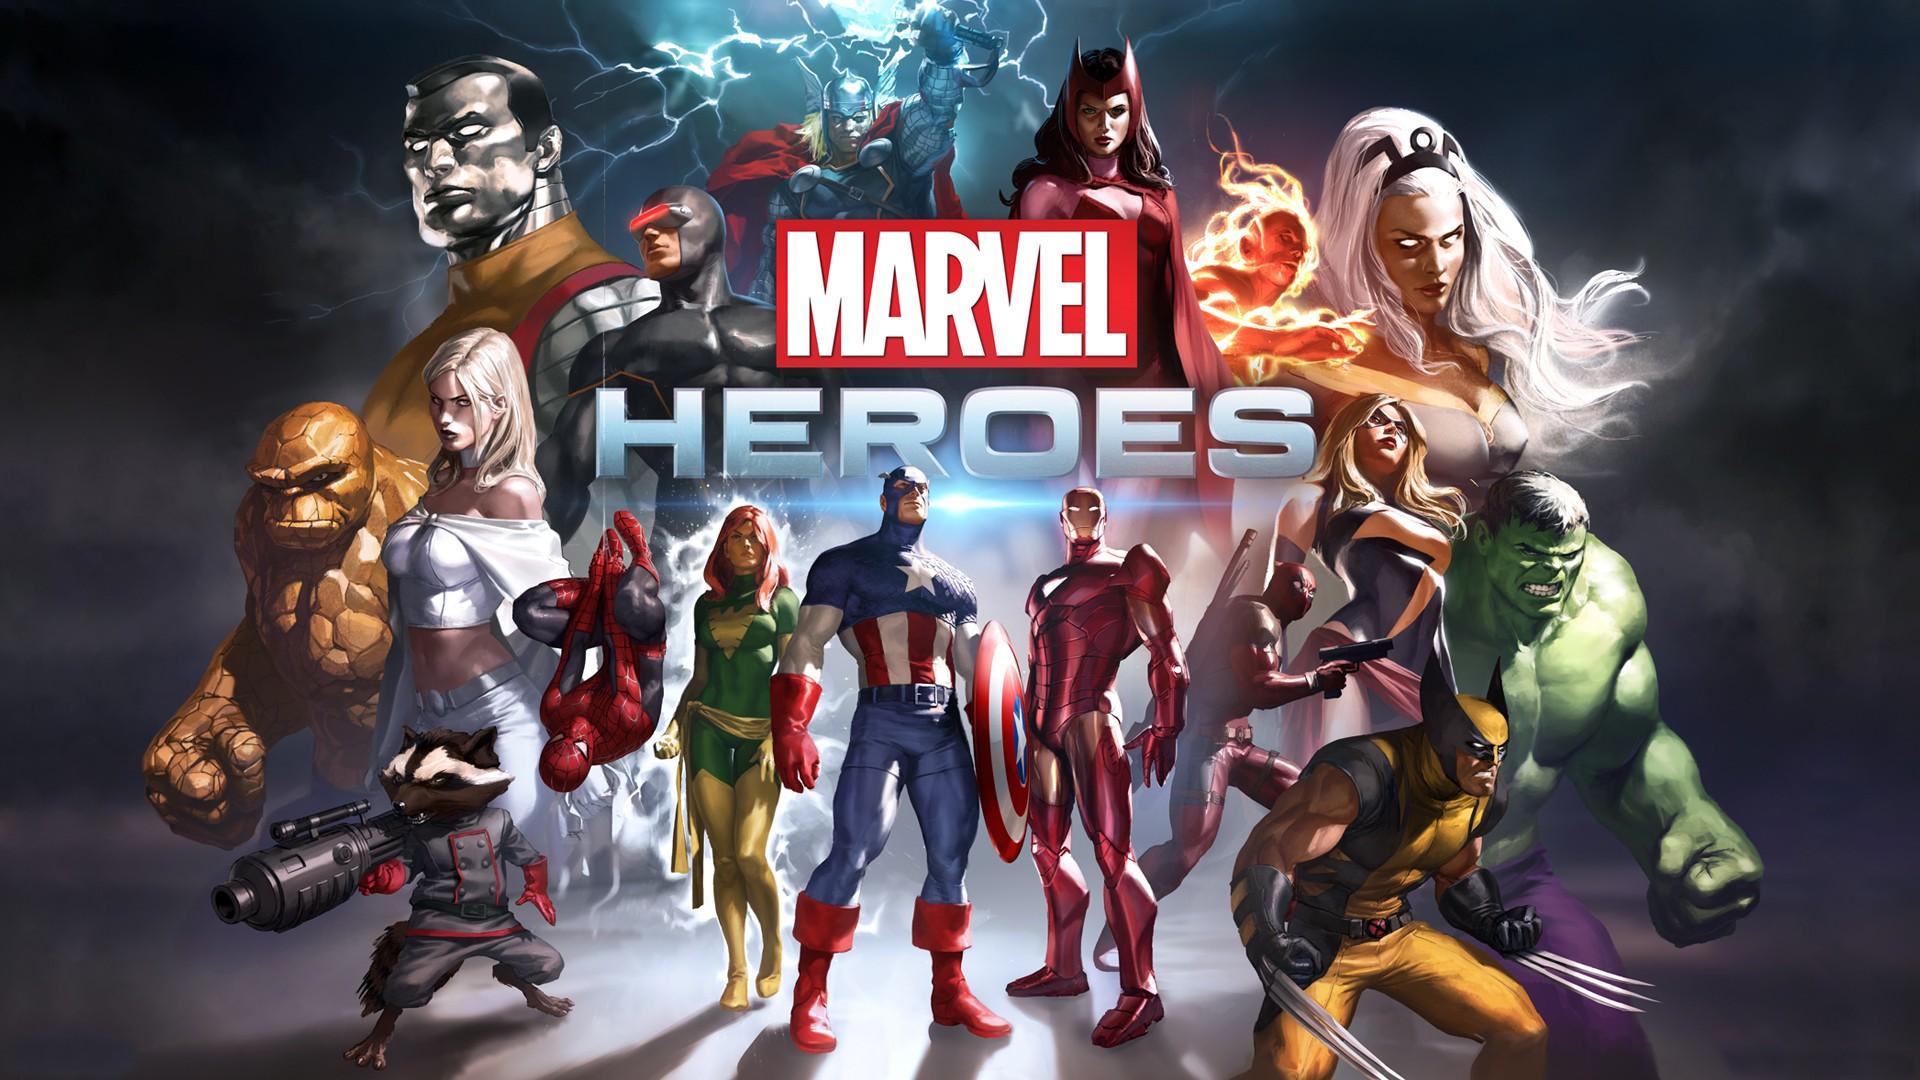 General 1920x1080 Marvel Heroes comic art Marvel Comics Iron Man Wolverine Spider-Man Captain America Hulk